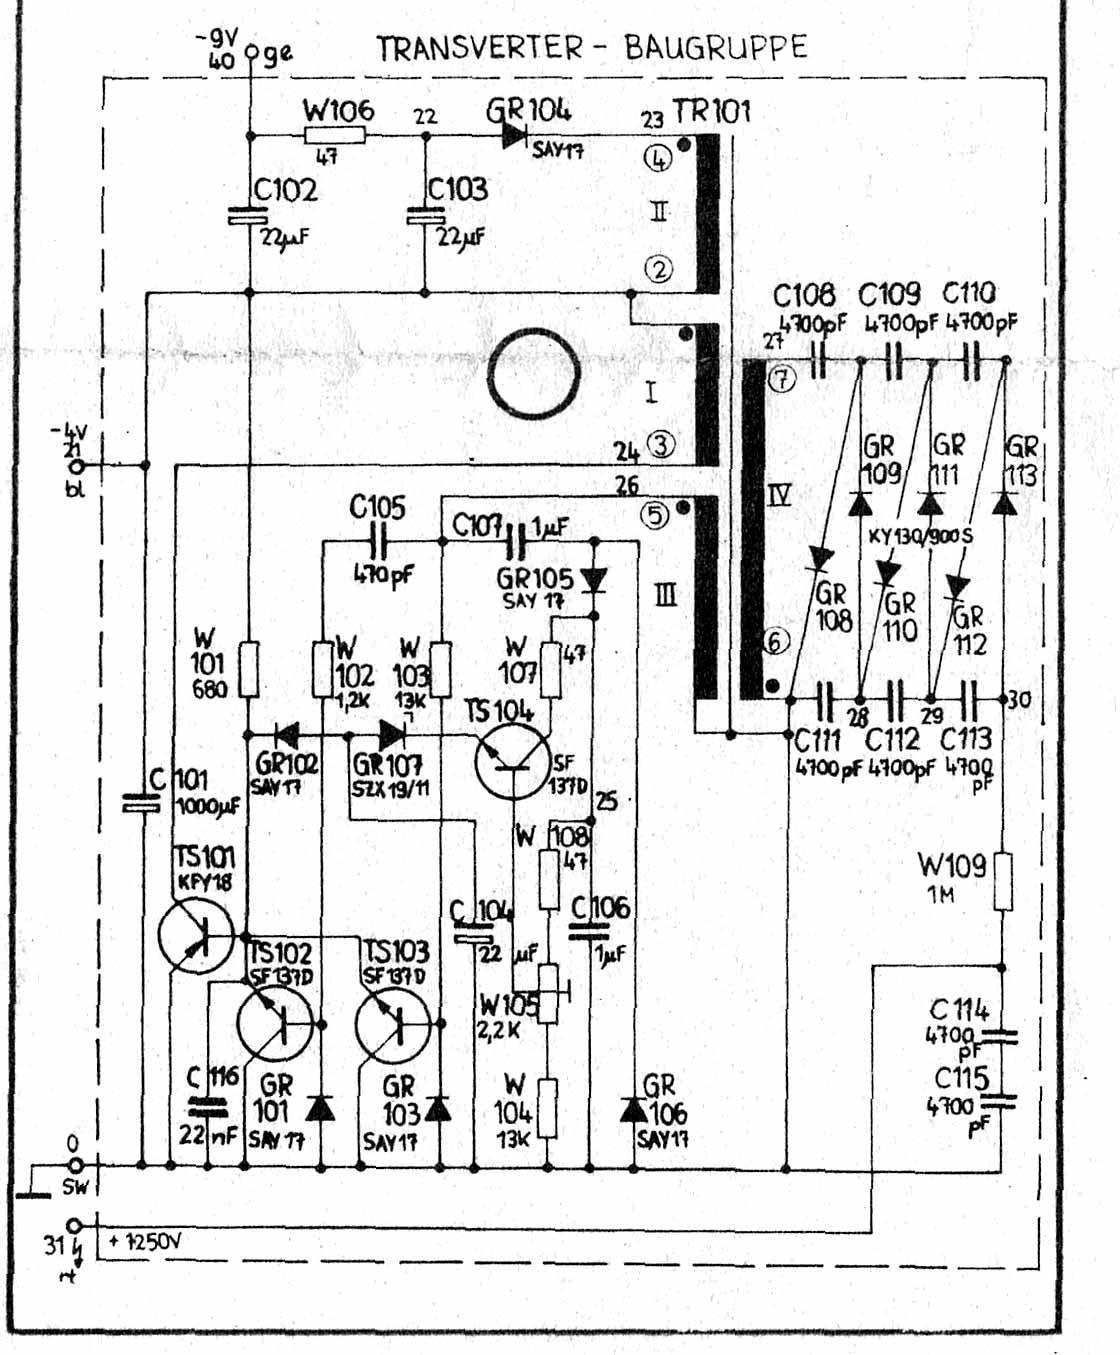 Schema Elettrico Inverter : Schema elettrico inverter saldatrice